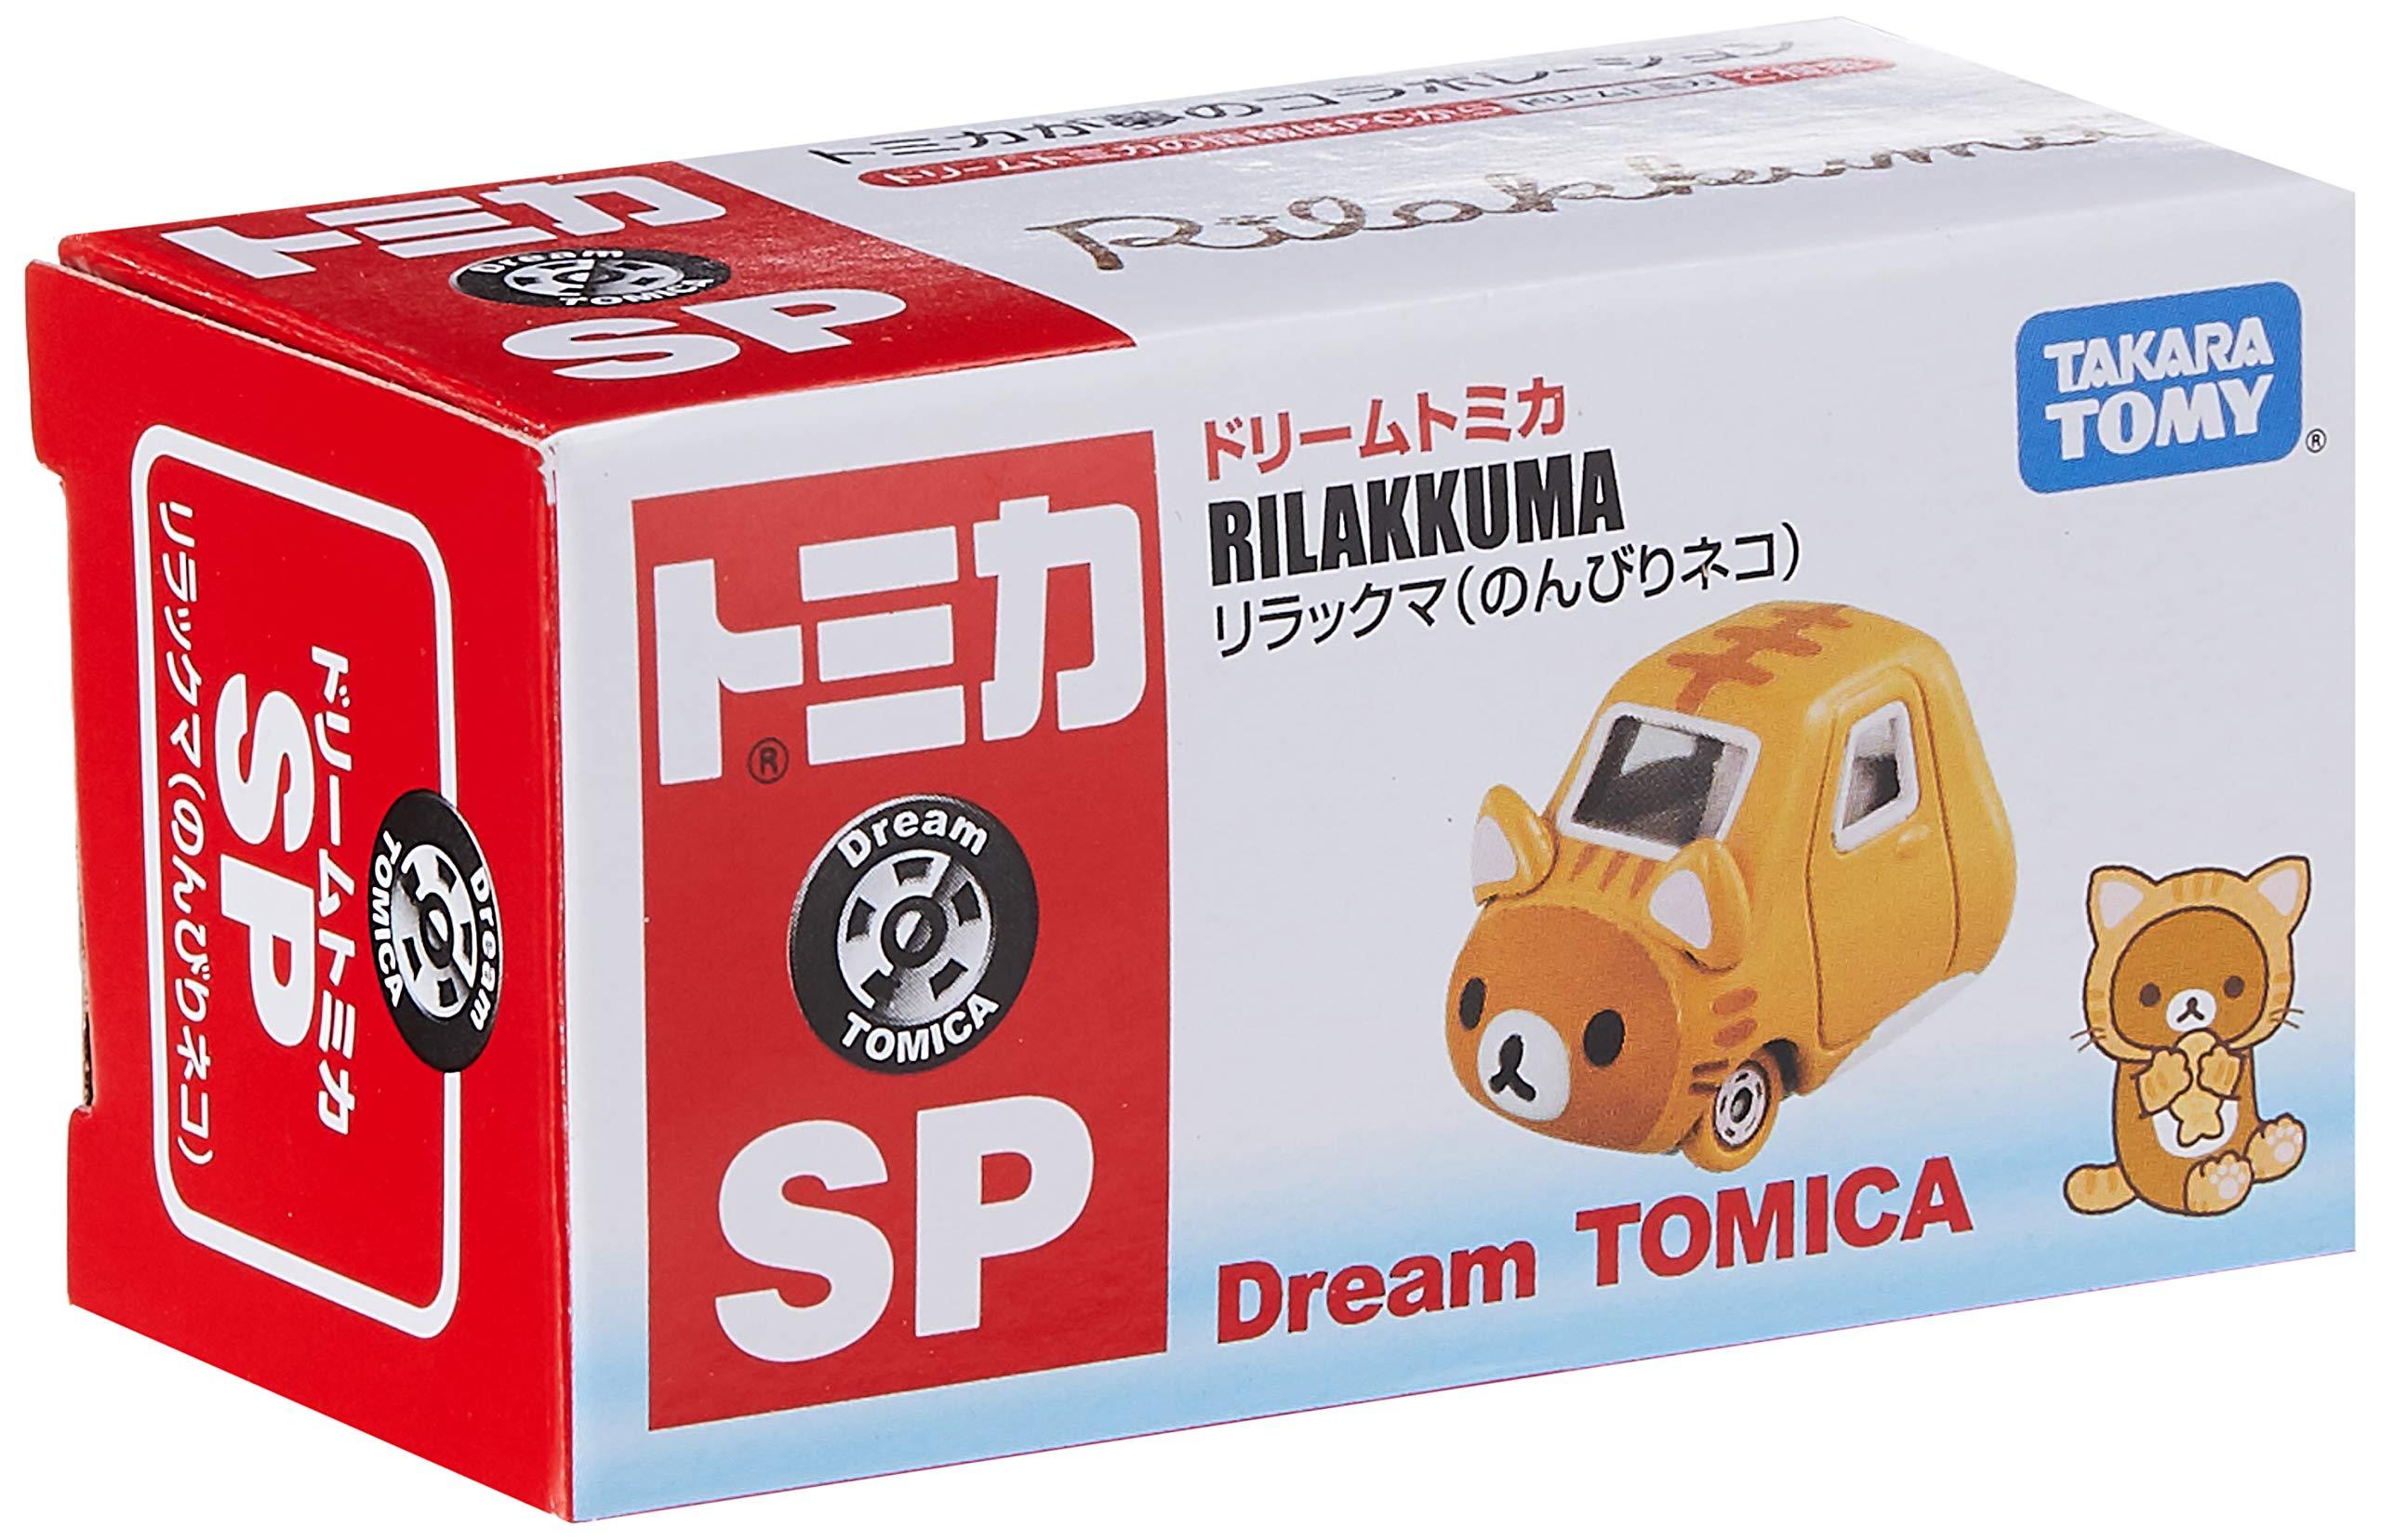 new TAKARA TOMY Dream Tomica Rilakkuma as Cat  *FREE SHIP USA